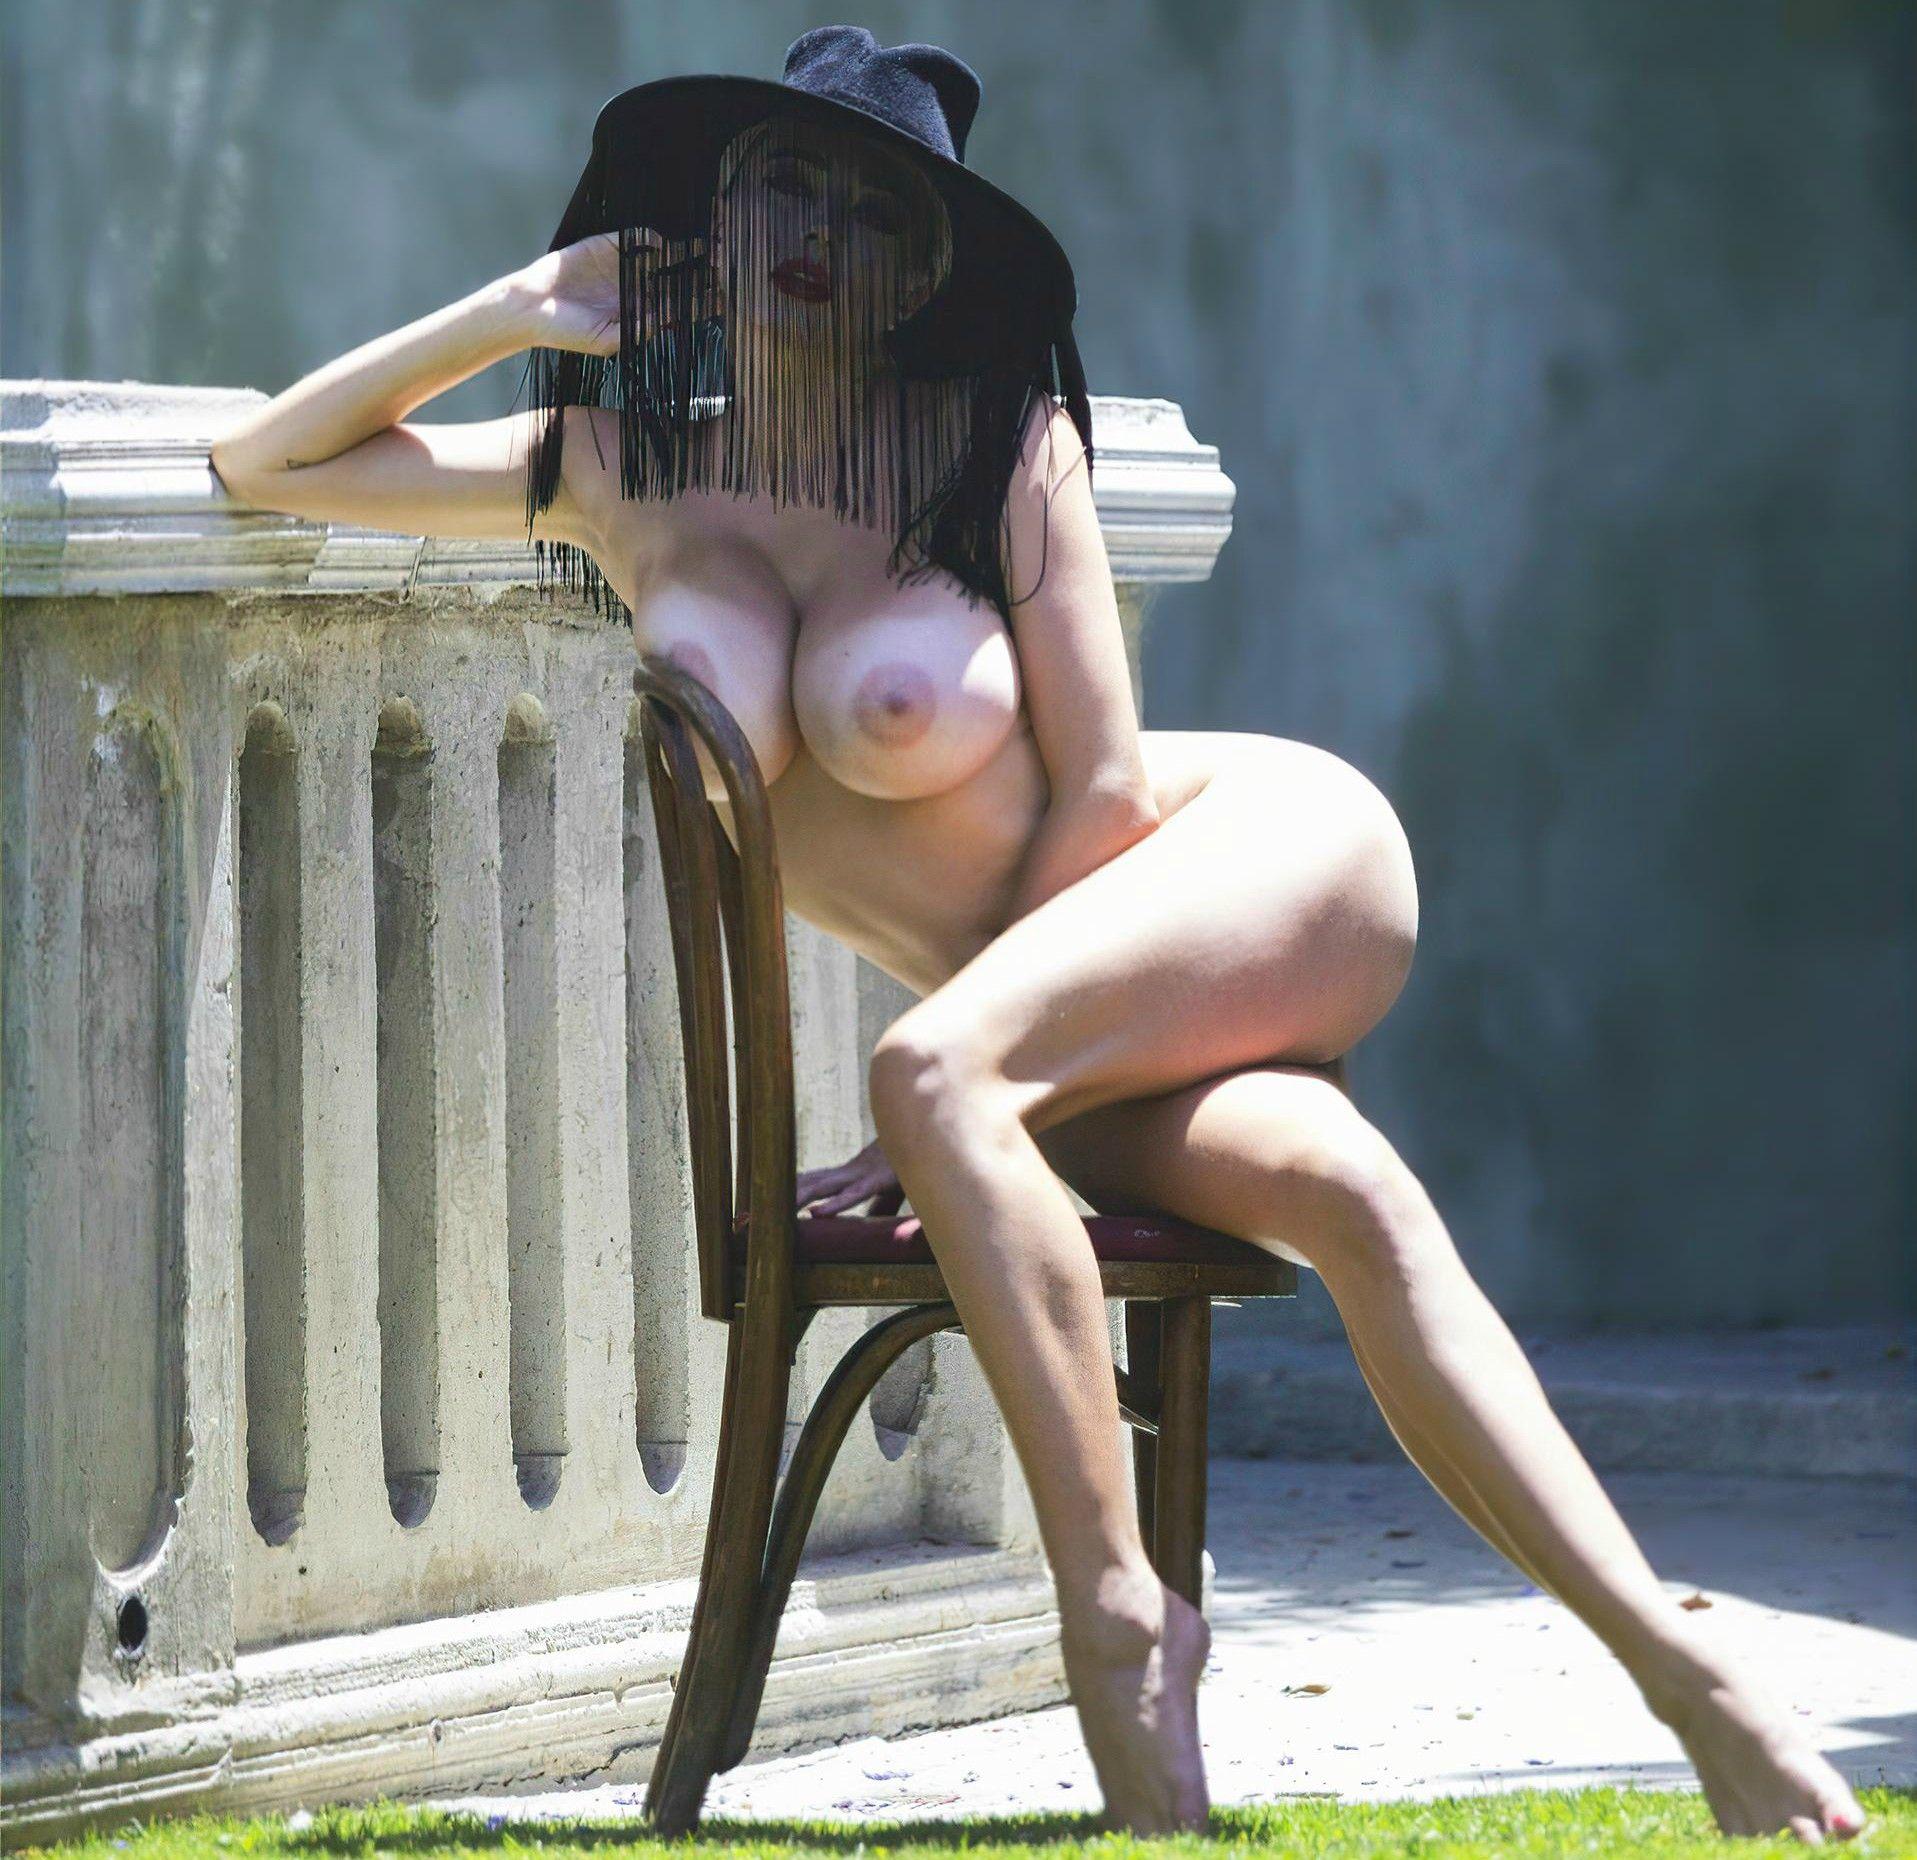 0906093204038_02_Caroline-Vreeland-Nude-Sexy-TheFappeningBlog.com-2.jpg